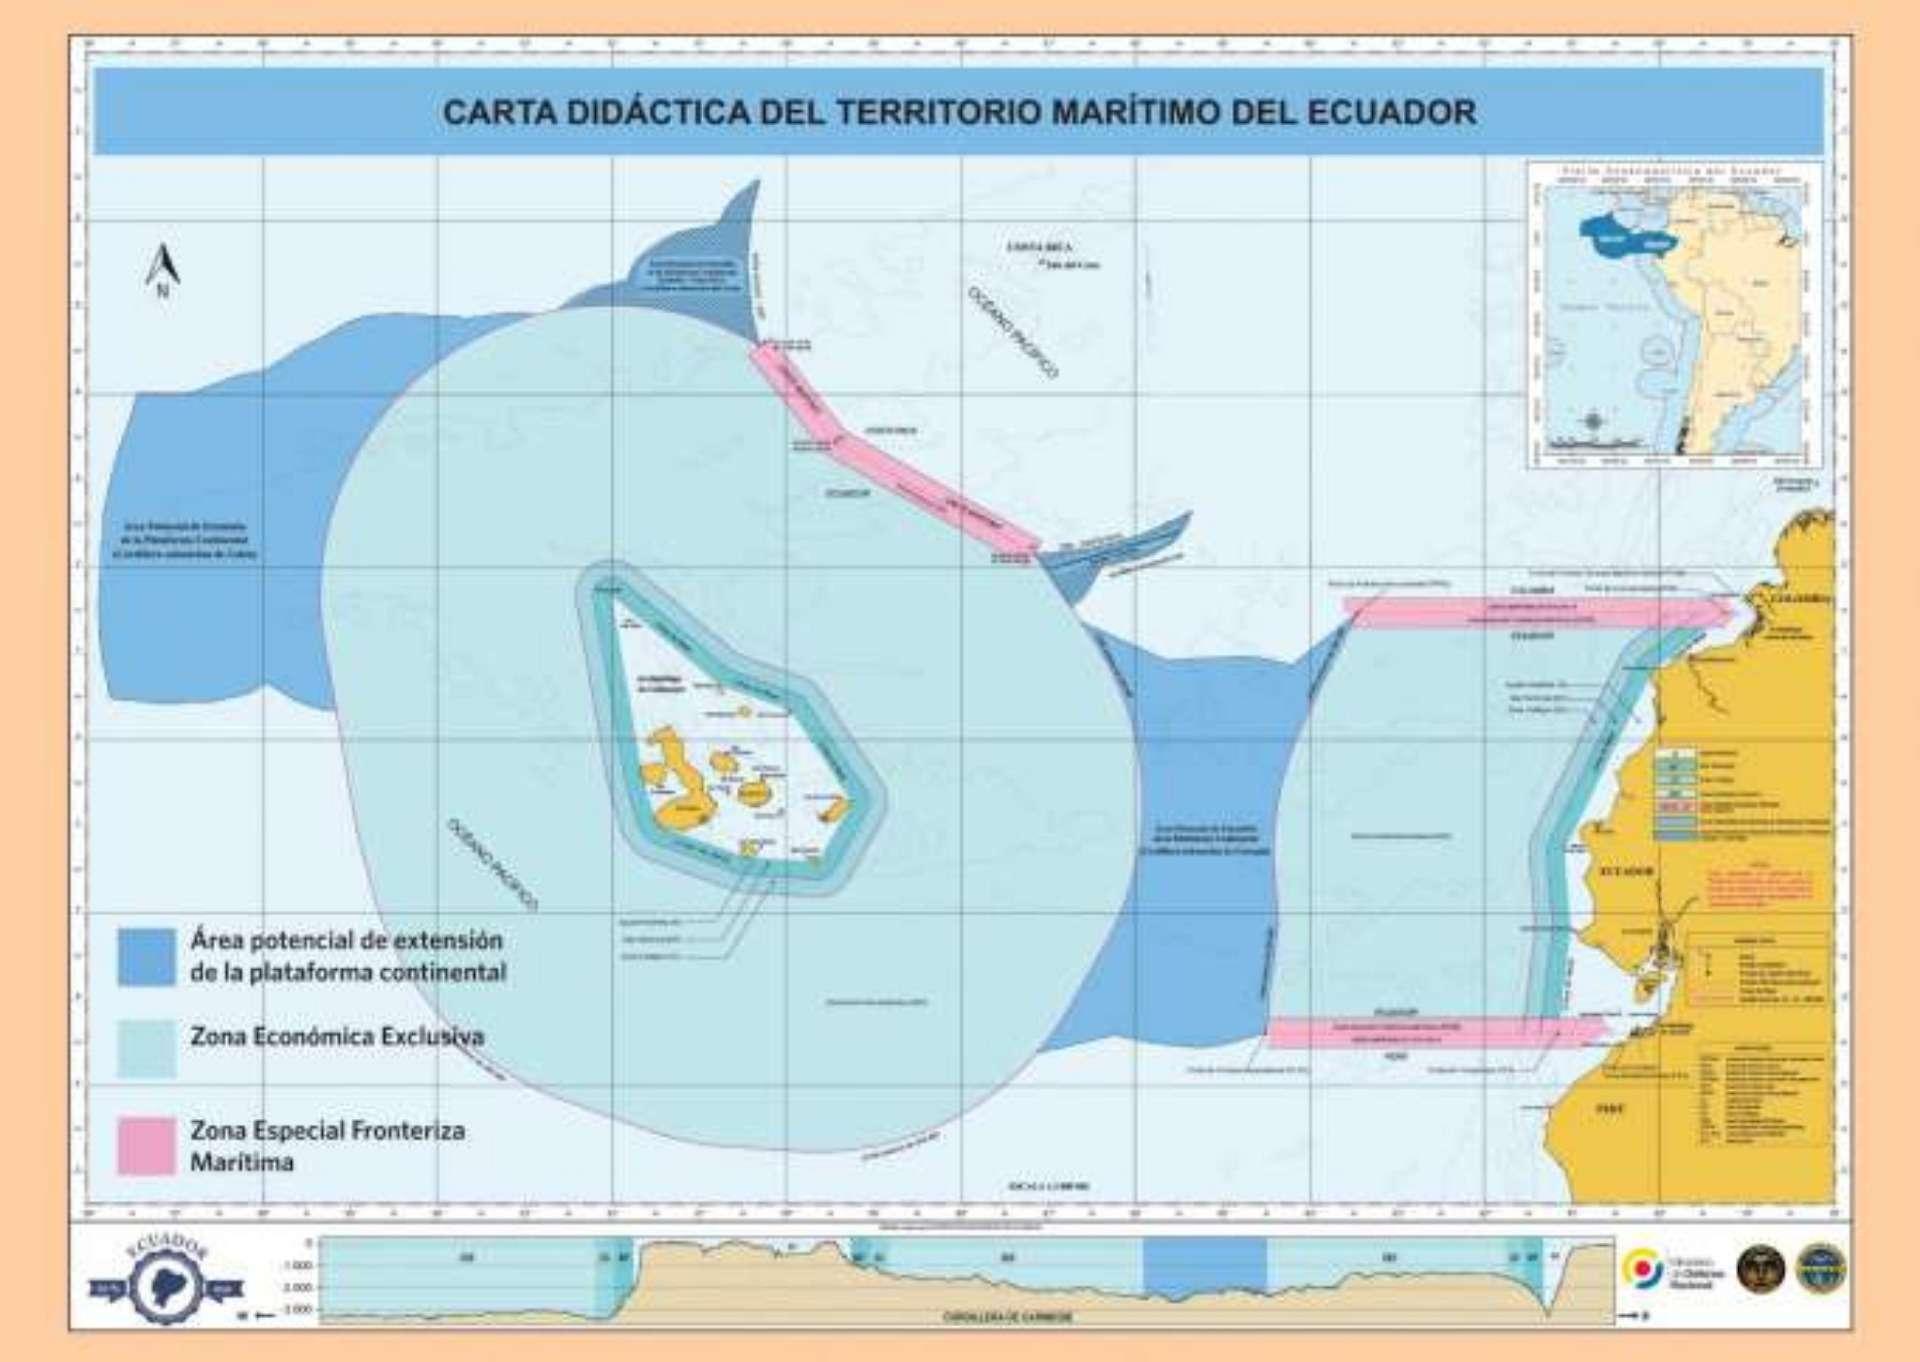 Ecuador and Galapagos marine Territory